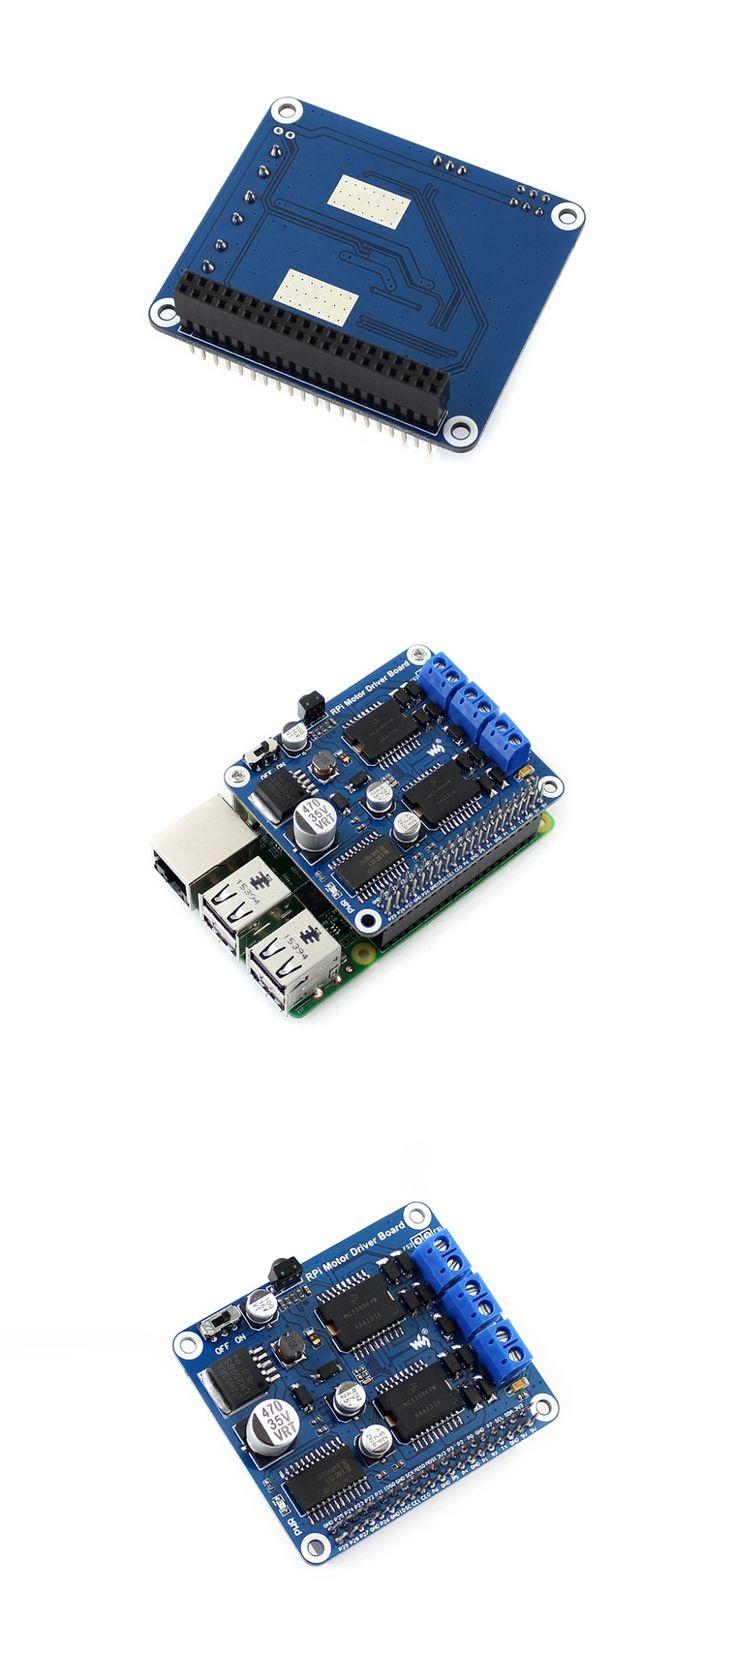 Waveshare RPi Motor Driver Board Raspberry Pi A+/B+/2B/3B Expansion DC Motor Board for DIY Mobil Robot / Stepper Motor Driver